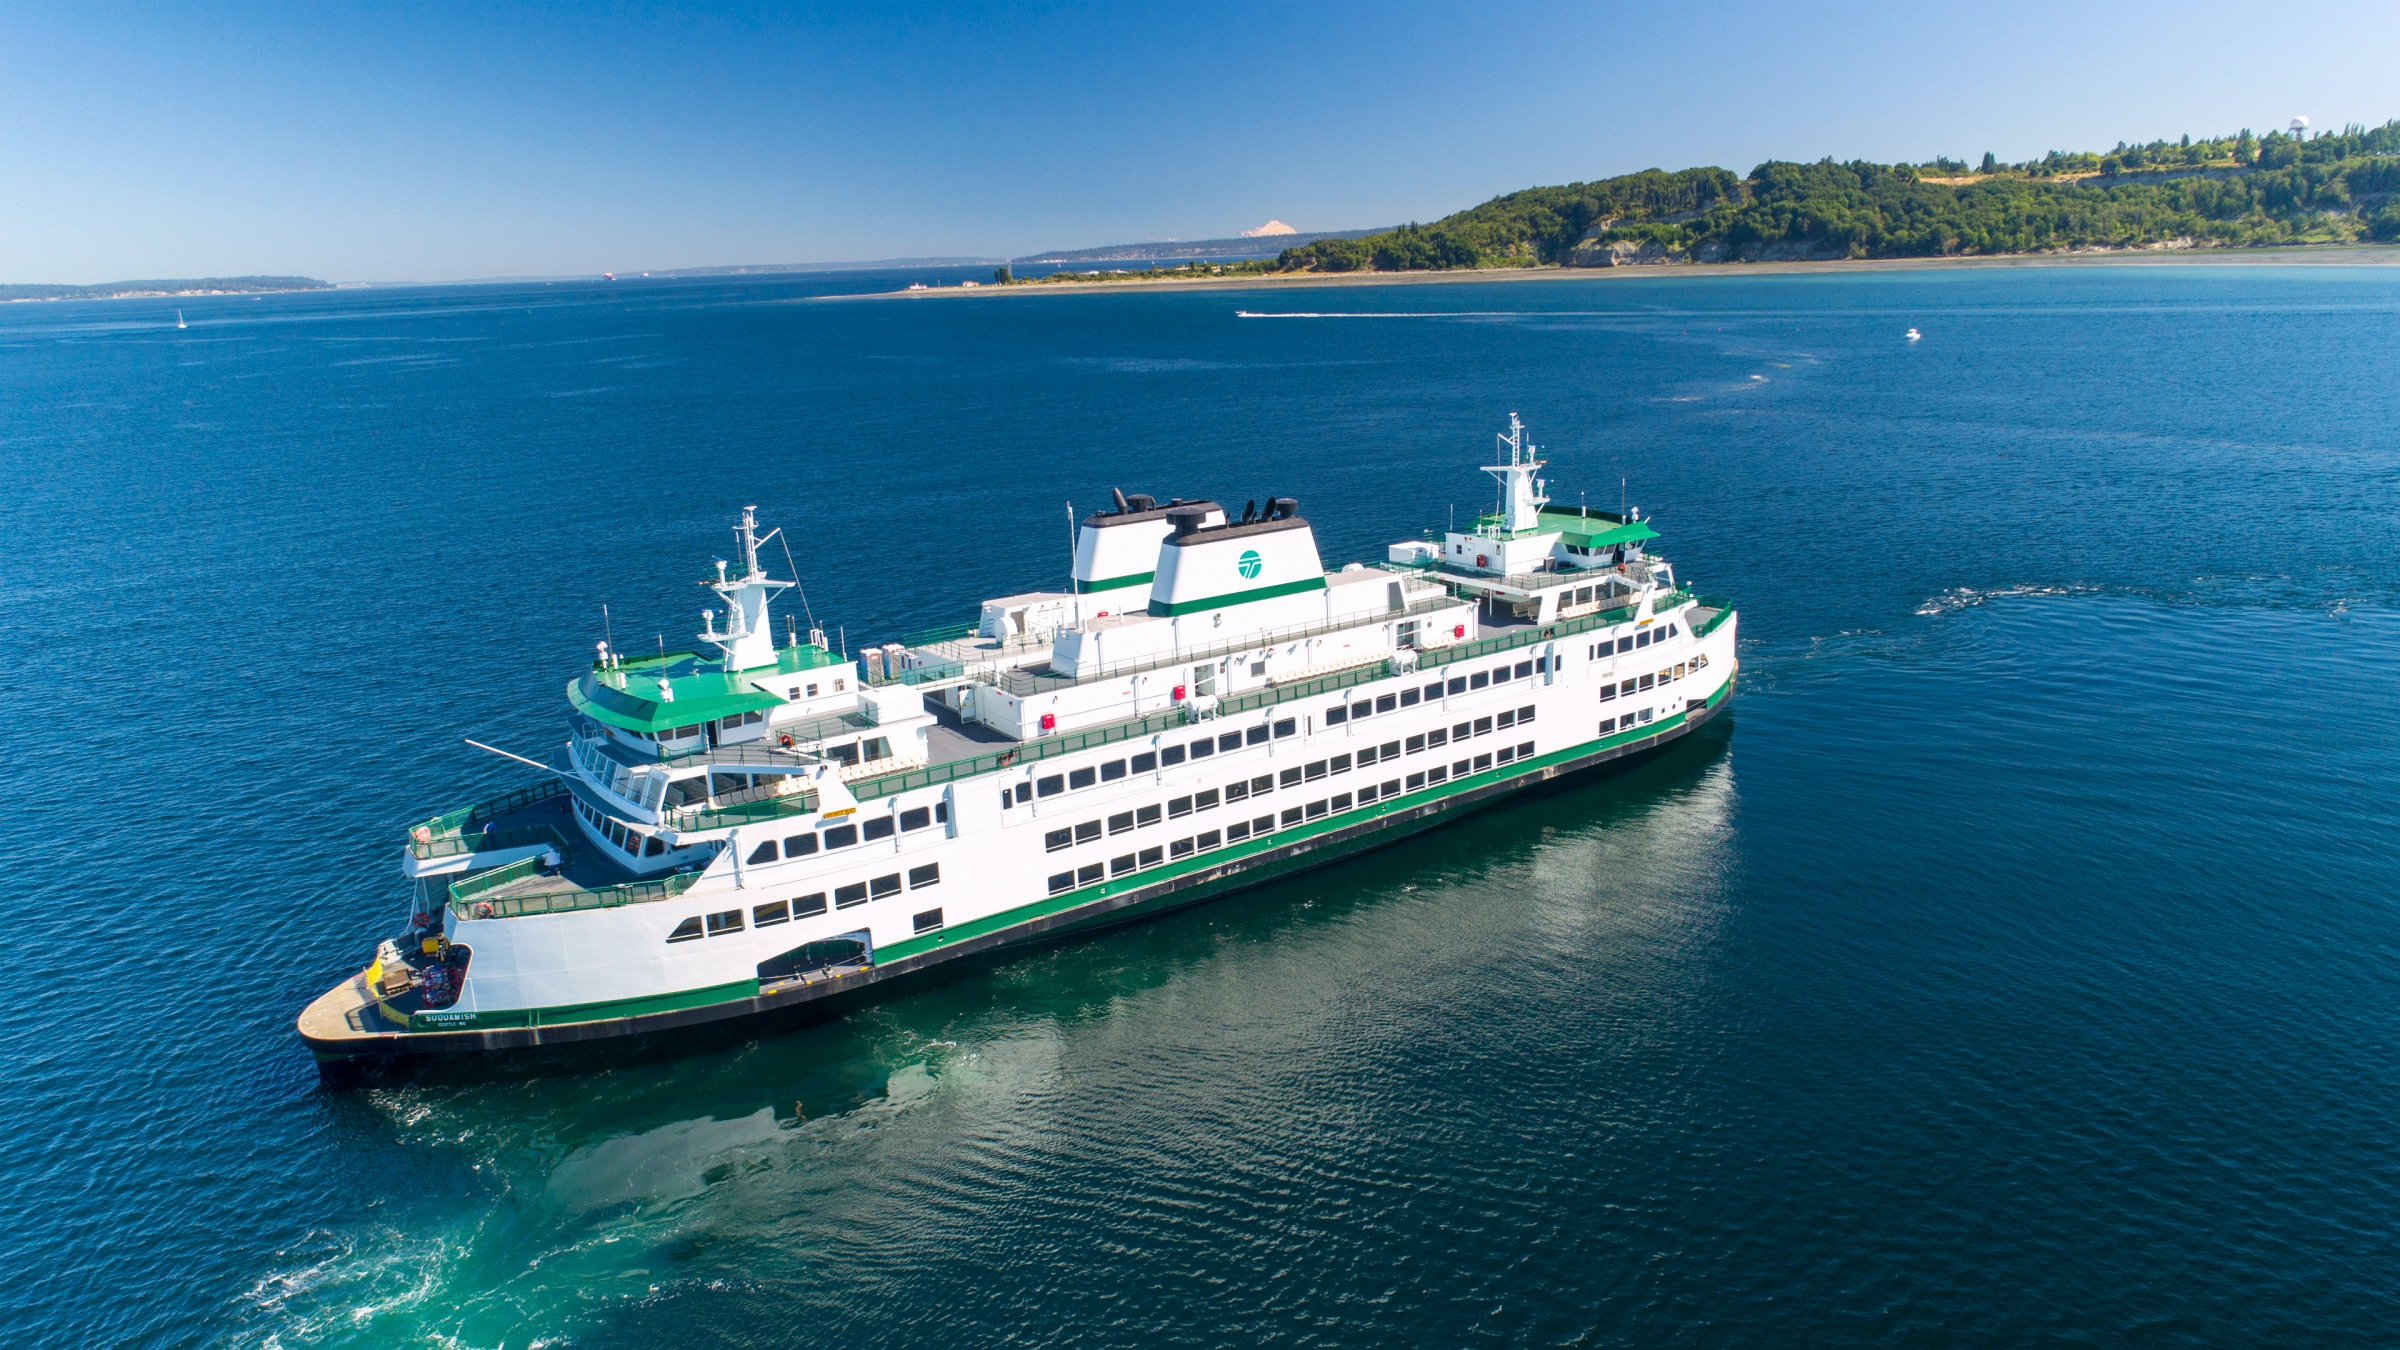 Washington State Ferry Suquamish during sea trials